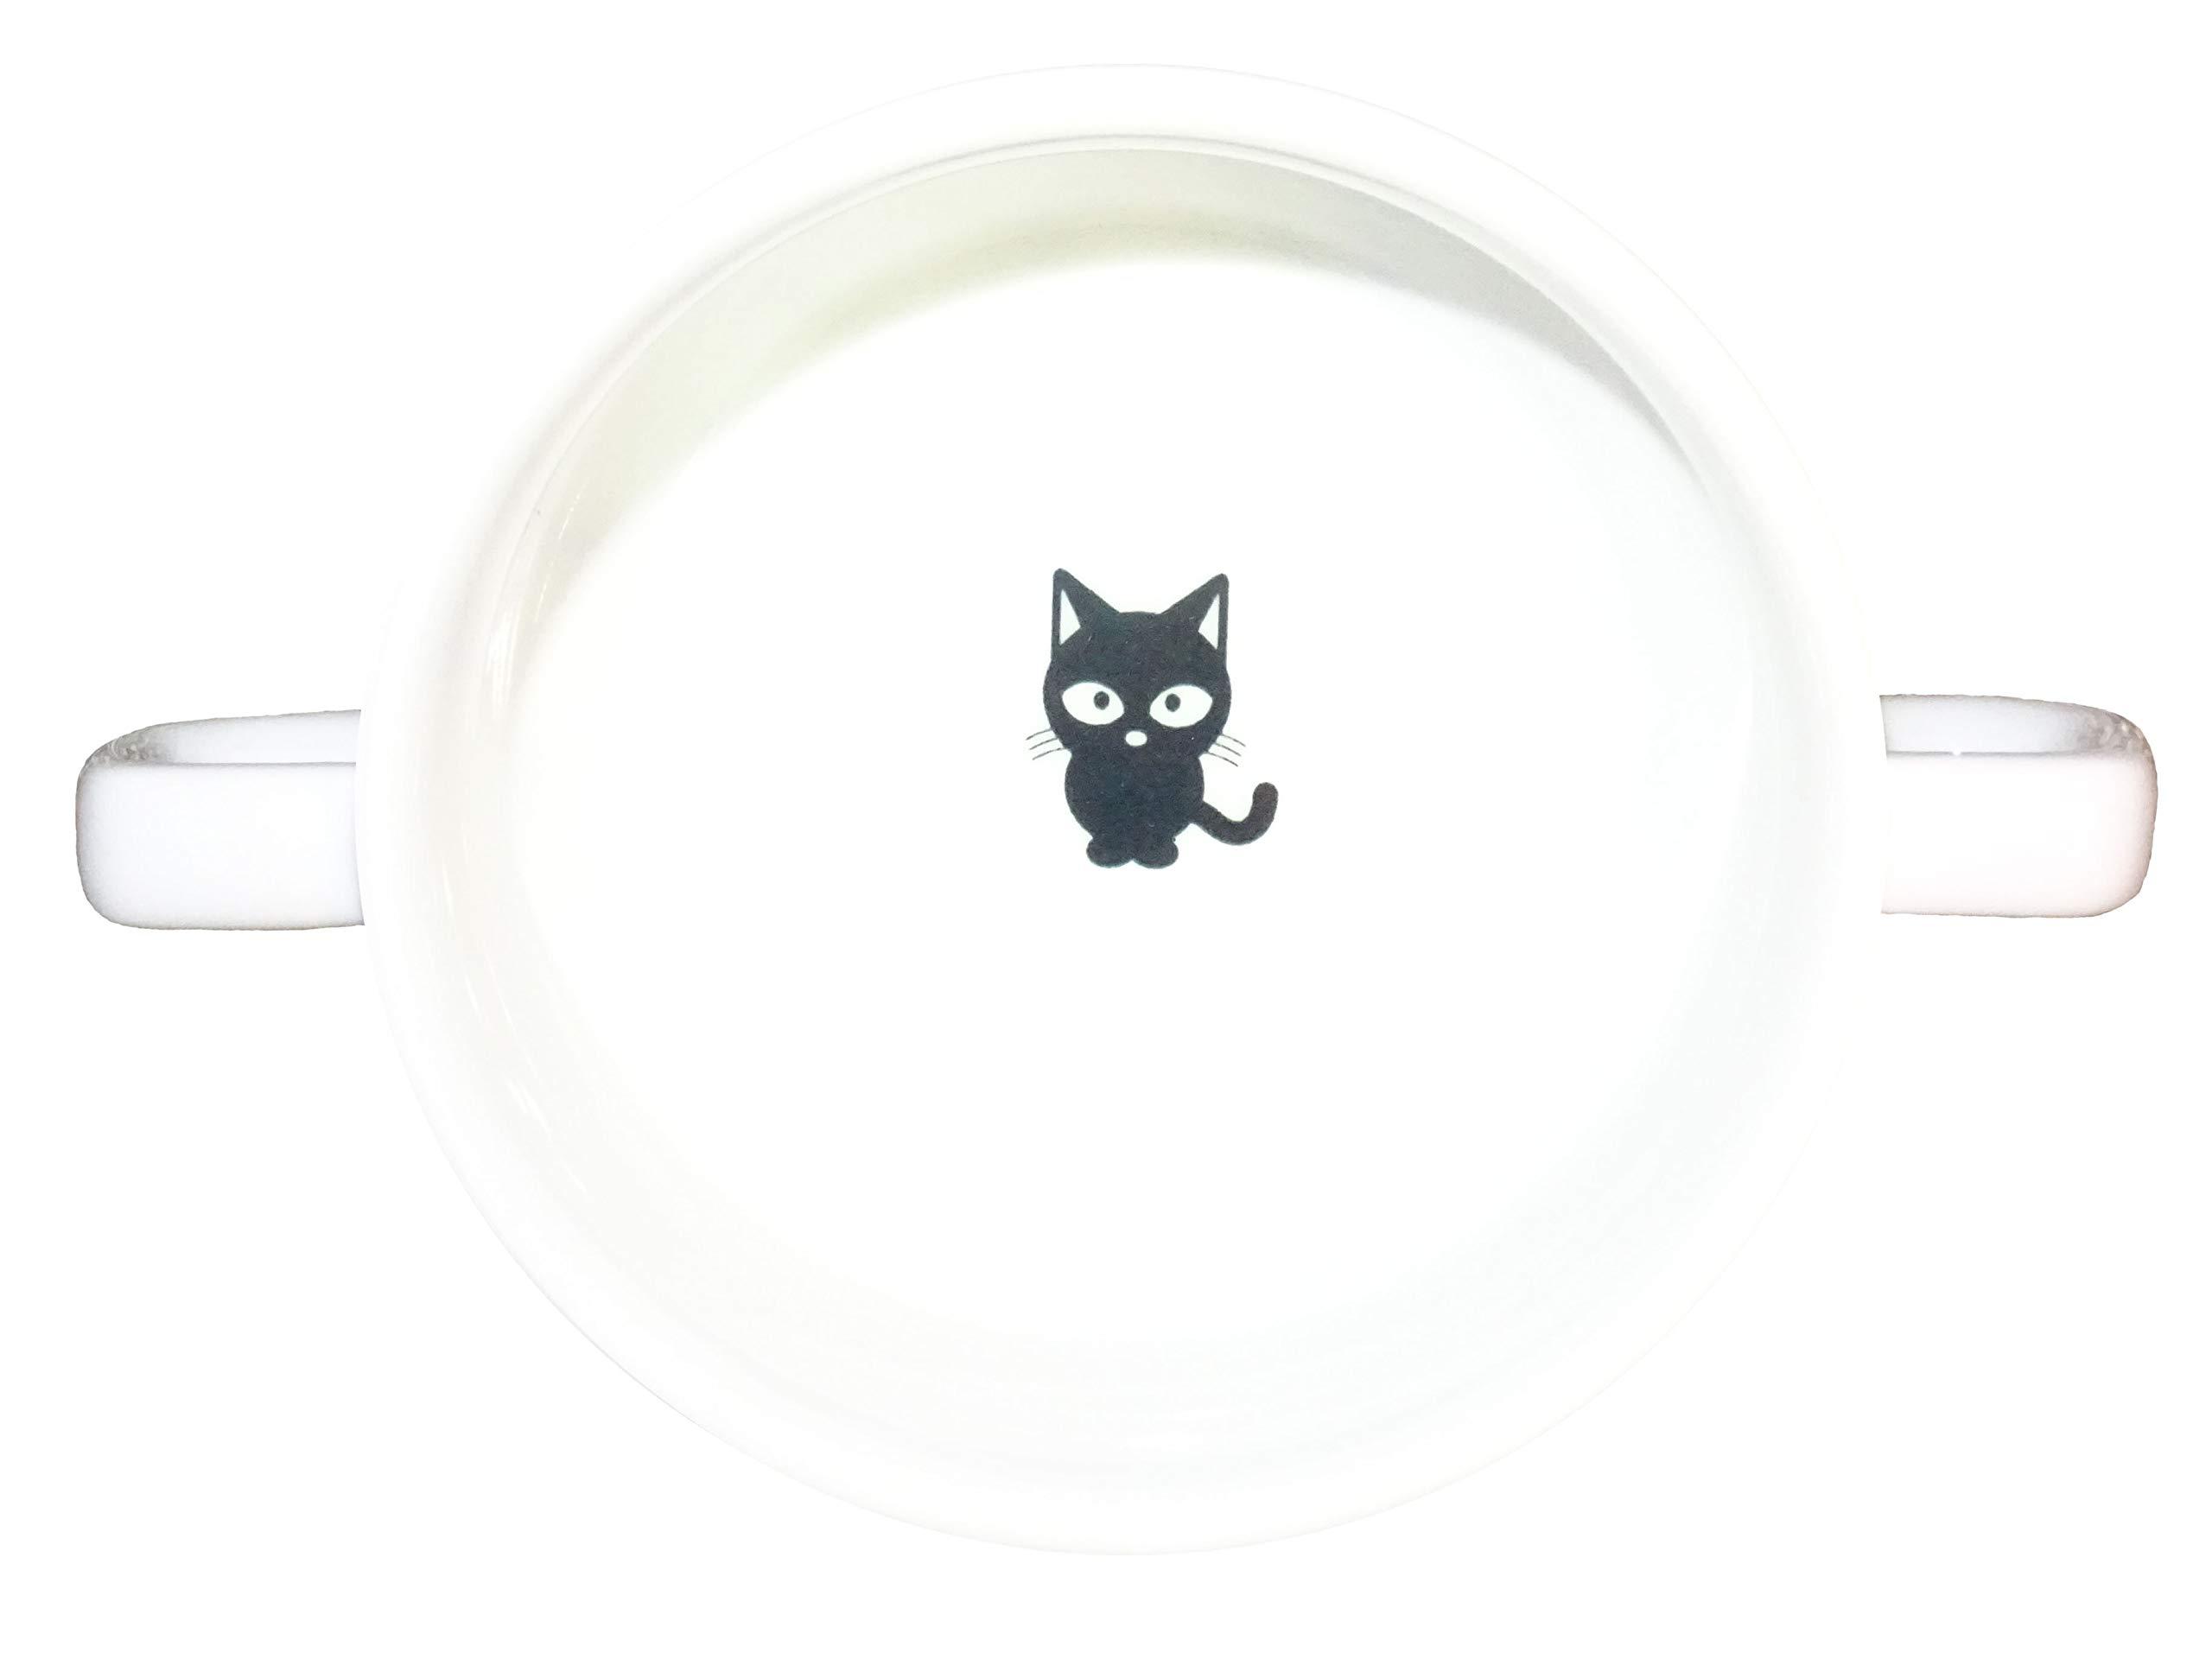 Soup Bowl 18, 1 pcs, cat Soup Bowl Small Baby Child Kids, Bottom, Hidden Message, Secret Message, Animal, Cartoon, Cute Animals, Kids, Porcelain